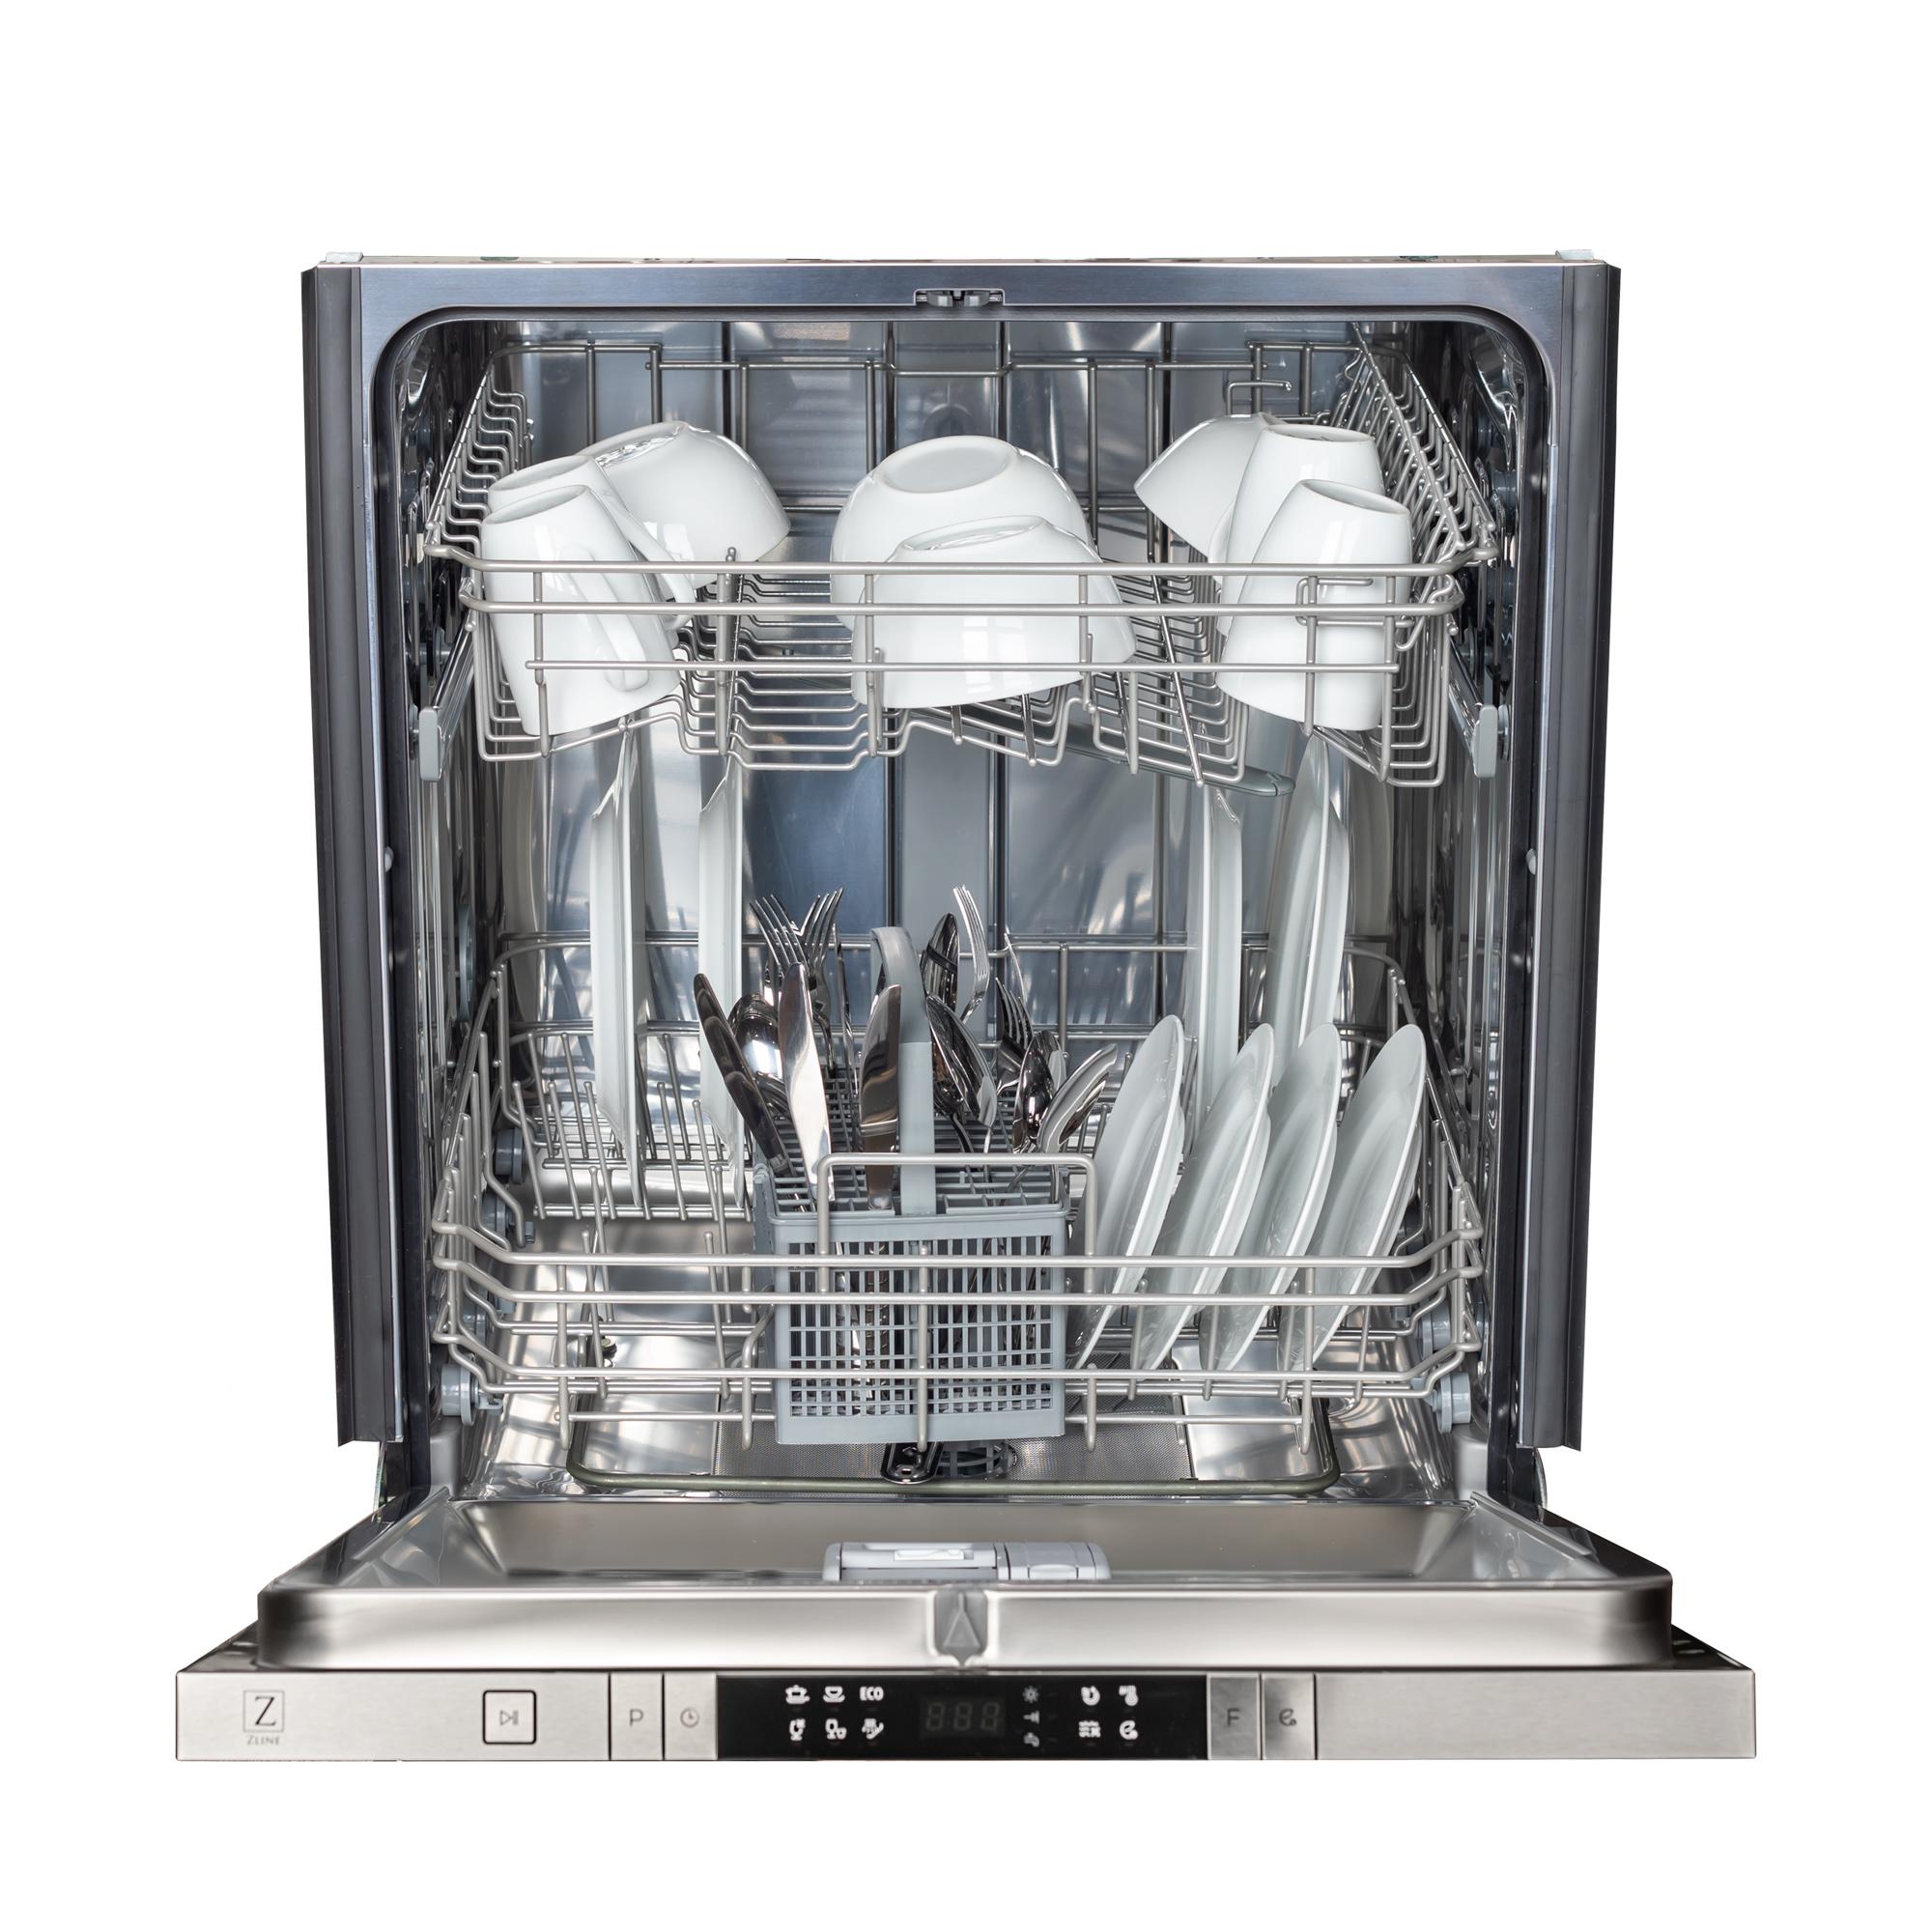 zline-panel-ready-dishwasher-copper-dw-c-24-dishes copy 2.jpg